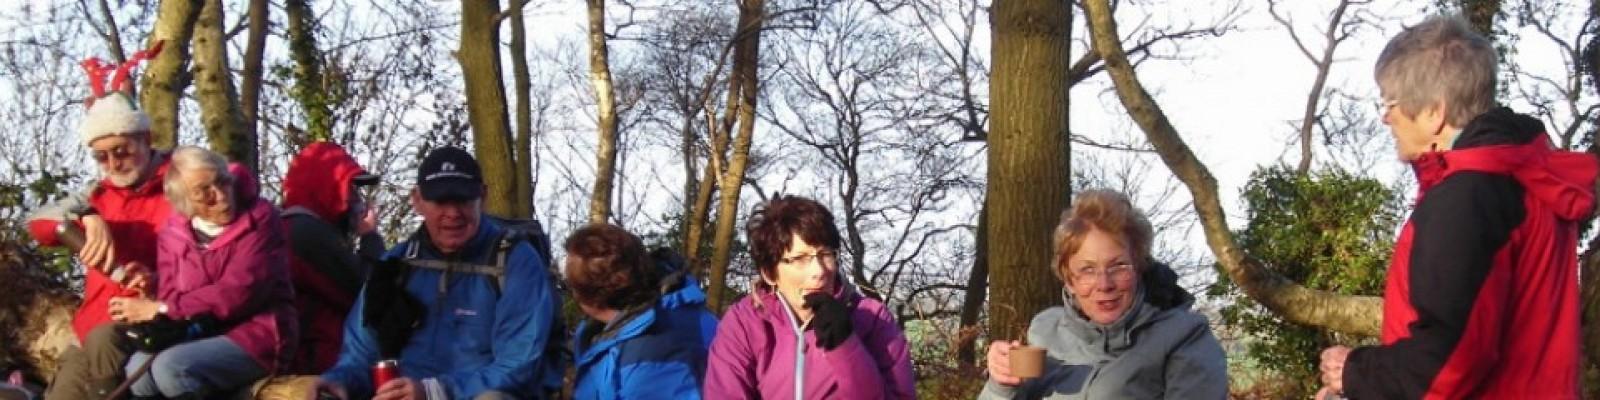 Cestrian Ramblers Christmas Walk